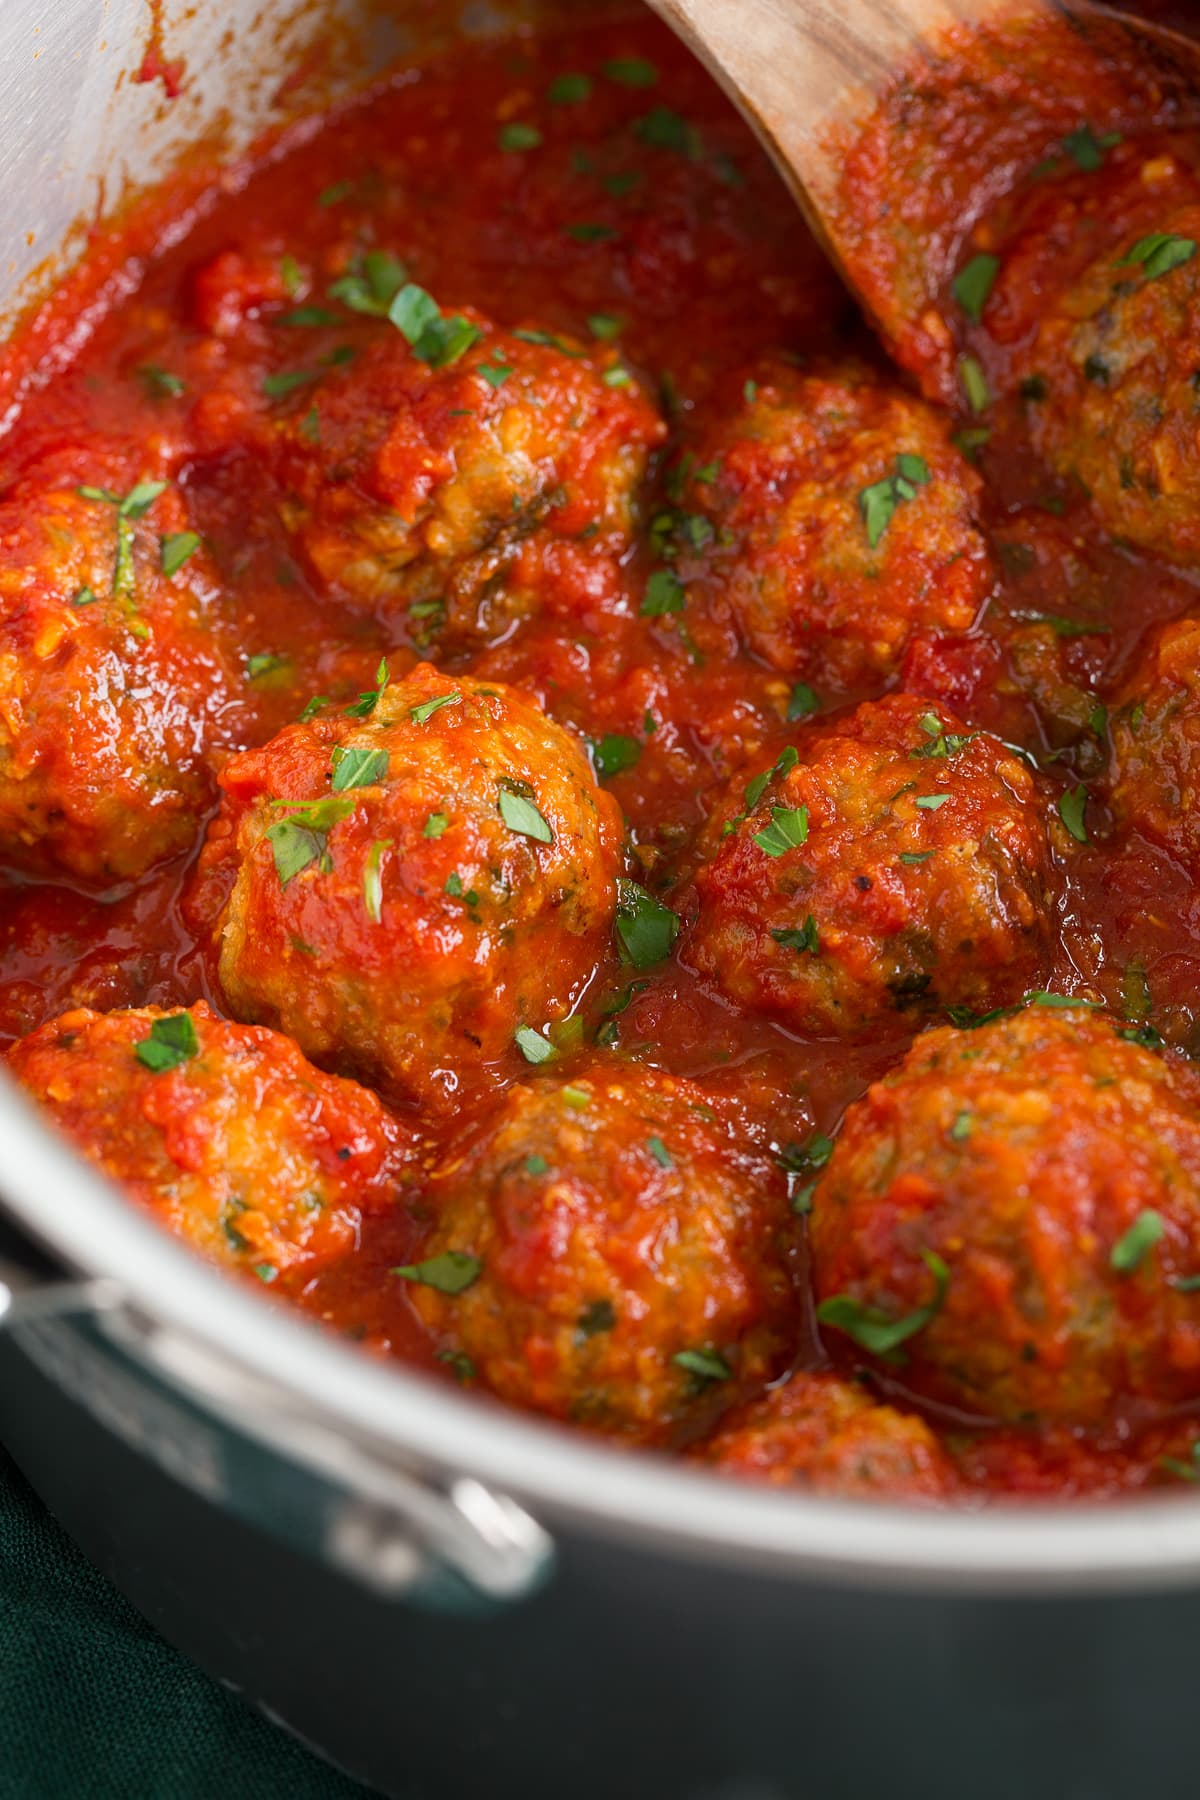 Turkey meatballs in marinara sauce in a saucepan.